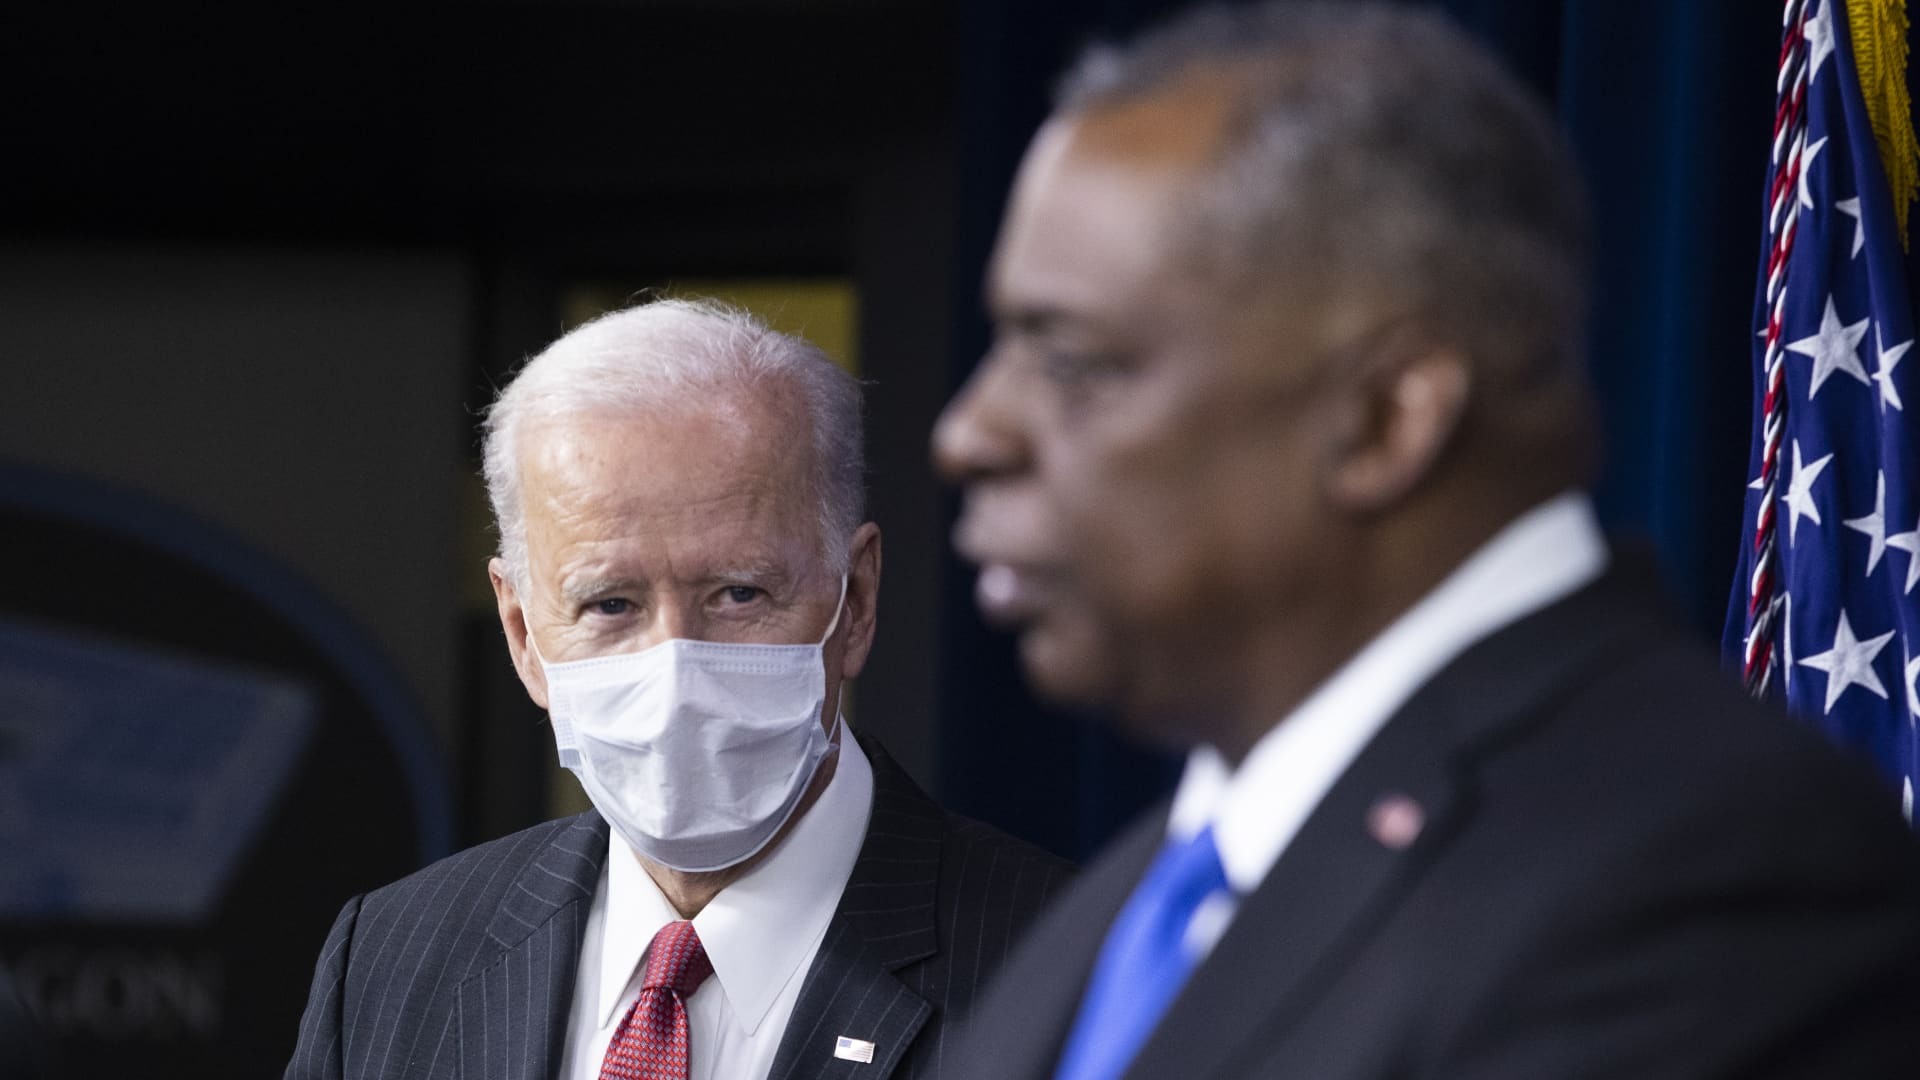 U.S. President Joe Biden listens as Lloyd Austin, U.S. secretary of defense, speaks at the Pentagon in Arlington, Virginia, U.S., on Wednesday, Feb. 10, 2021.